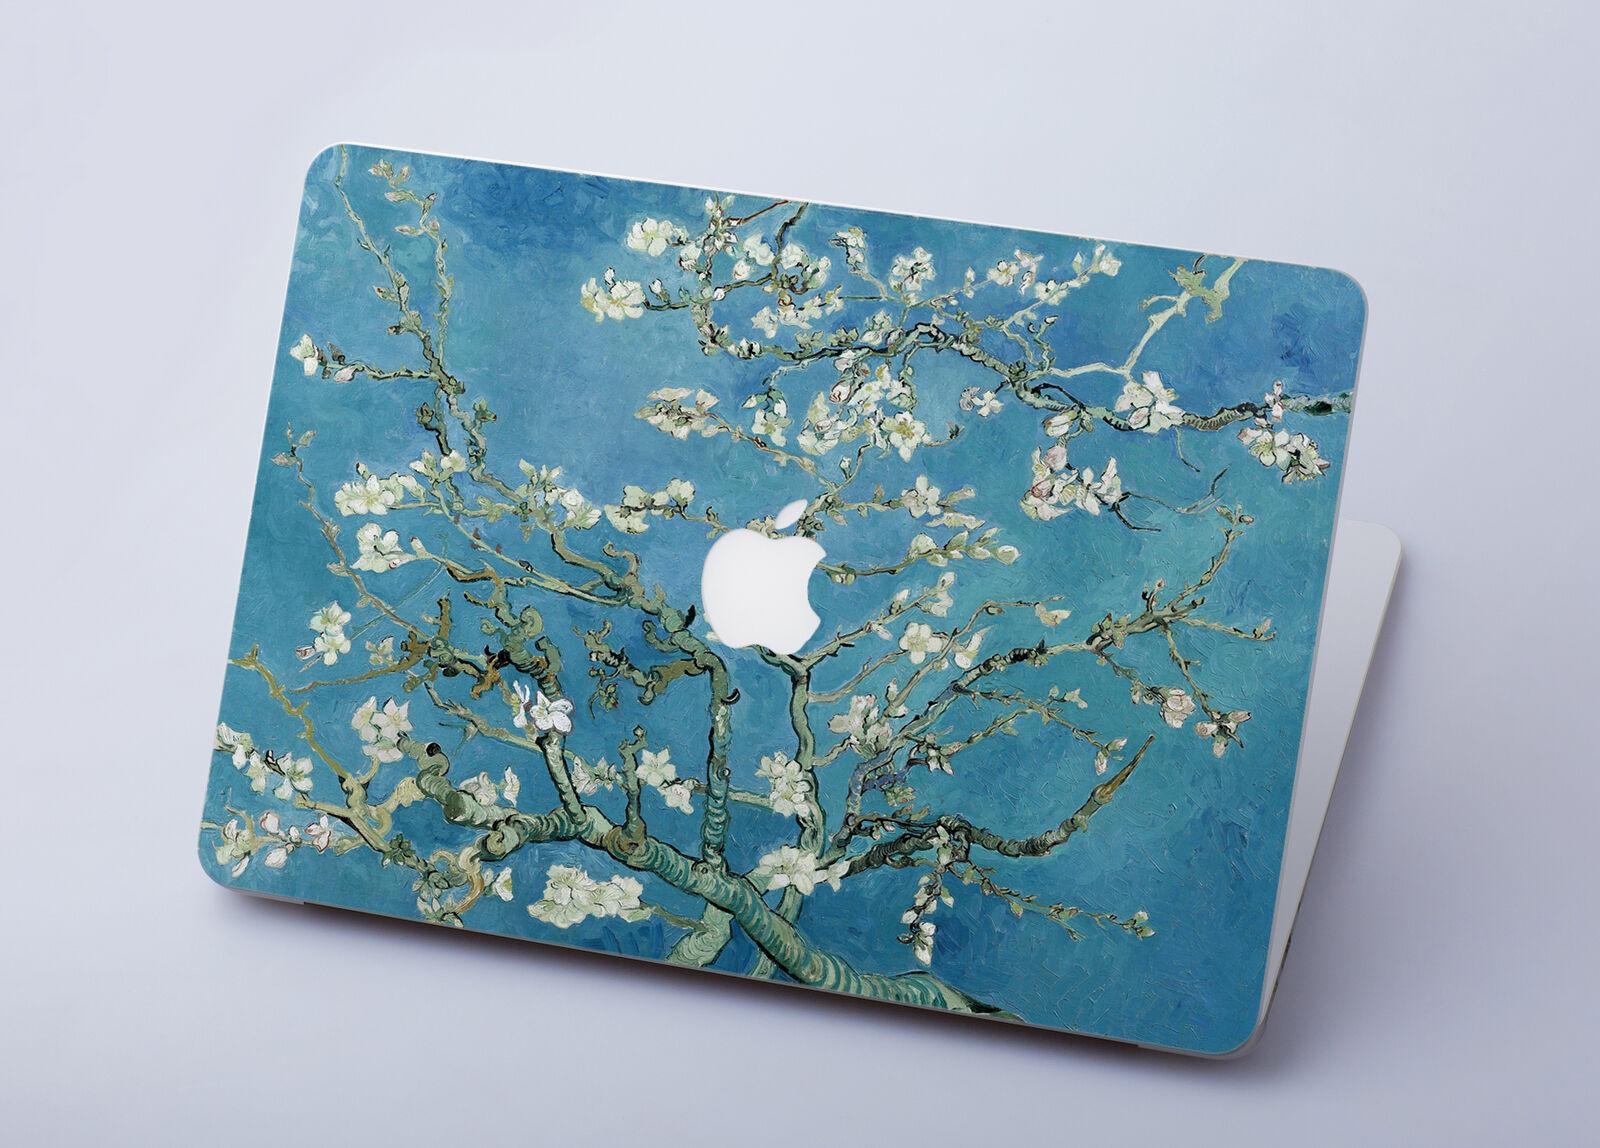 Van Gogh Amandelbloesem Hard Case For Macbook Pro Retina Air 11 12 13 15 2016